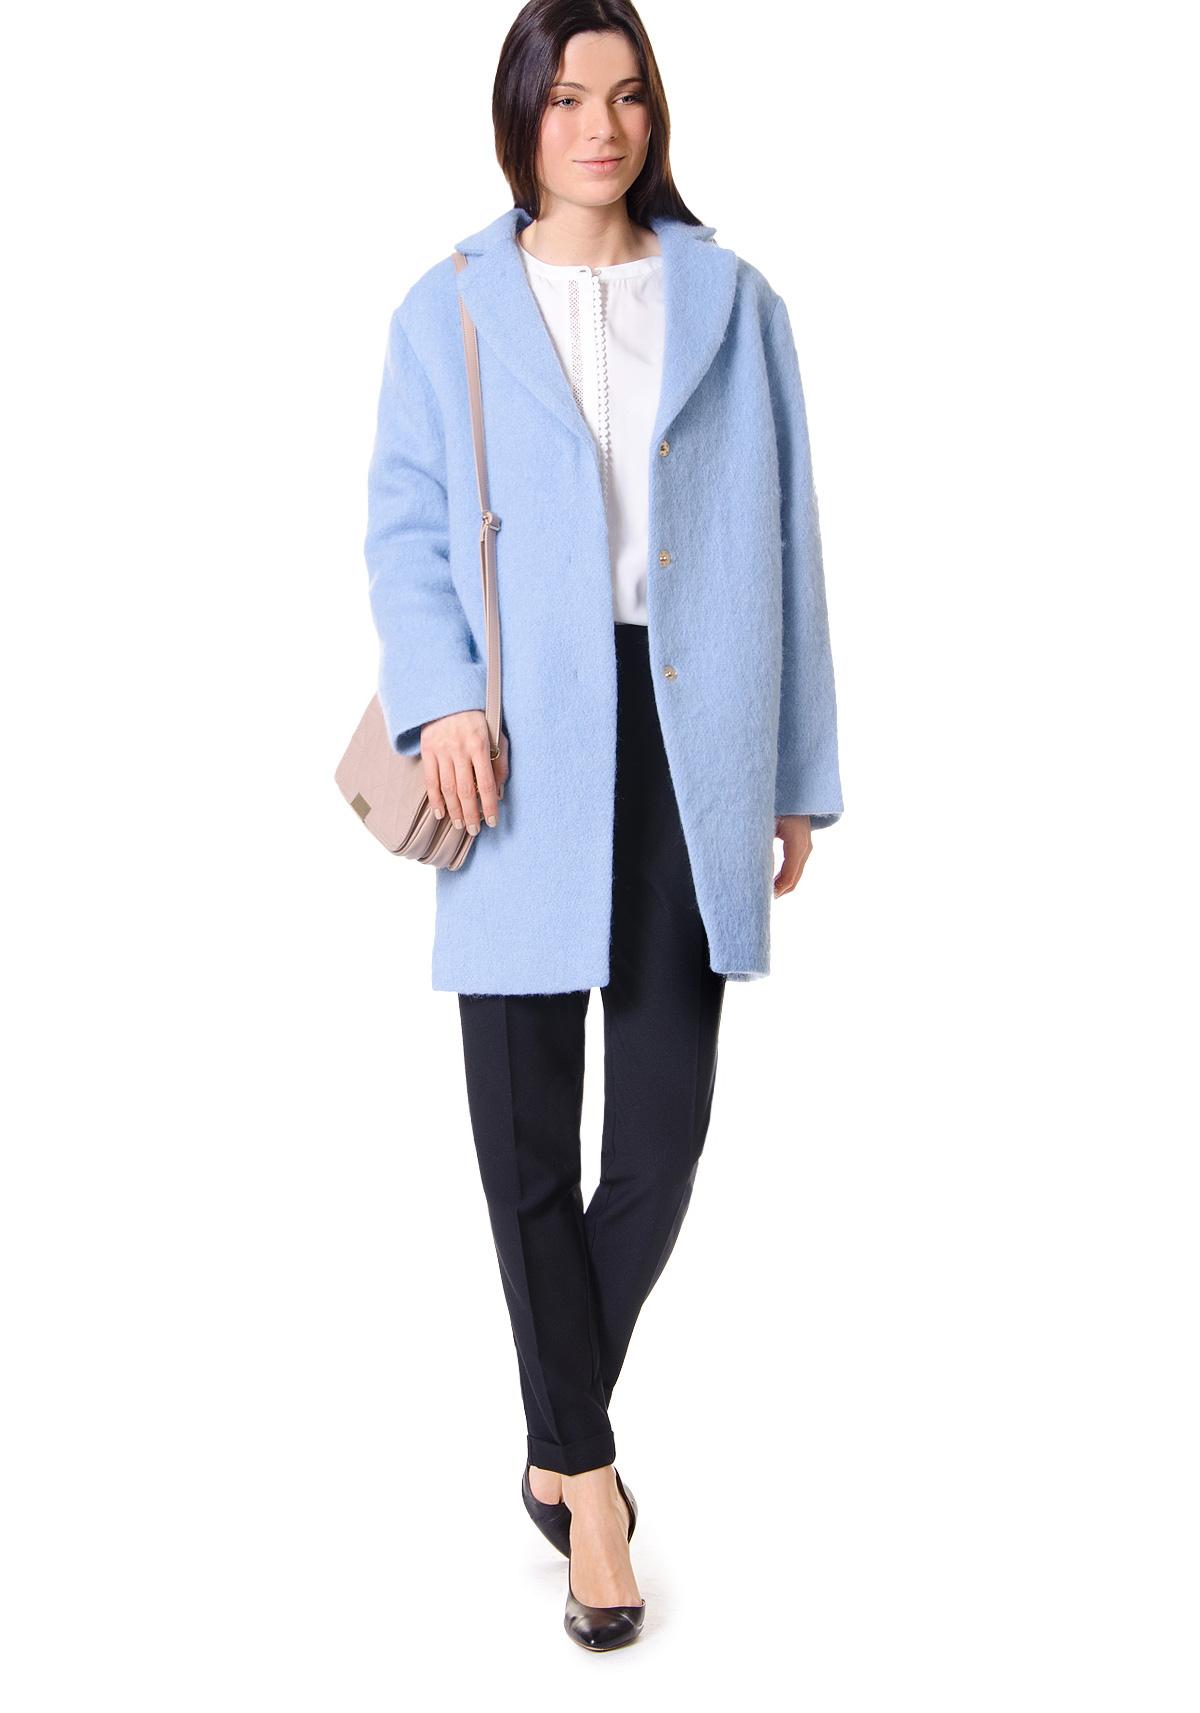 2a816623809 Пальто - синий цвет. Состав  30% шерсть